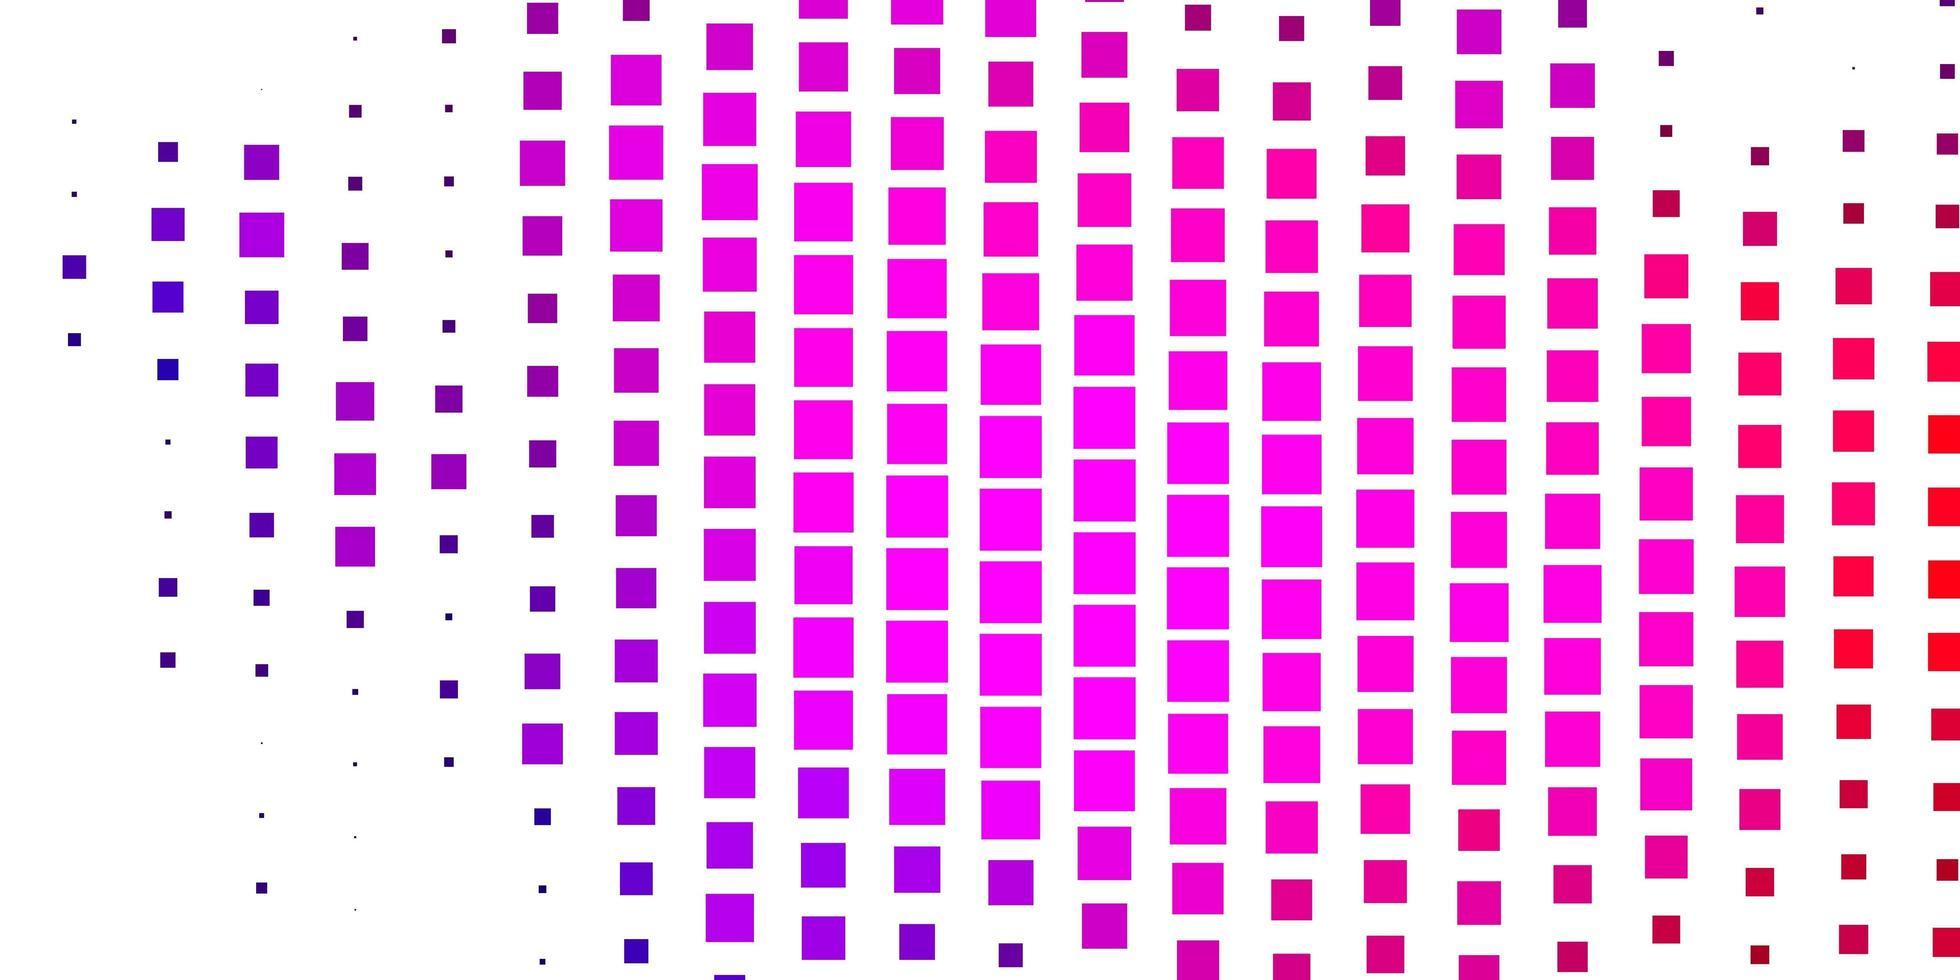 rosa, blaues und rotes Layout mit Quadraten. vektor